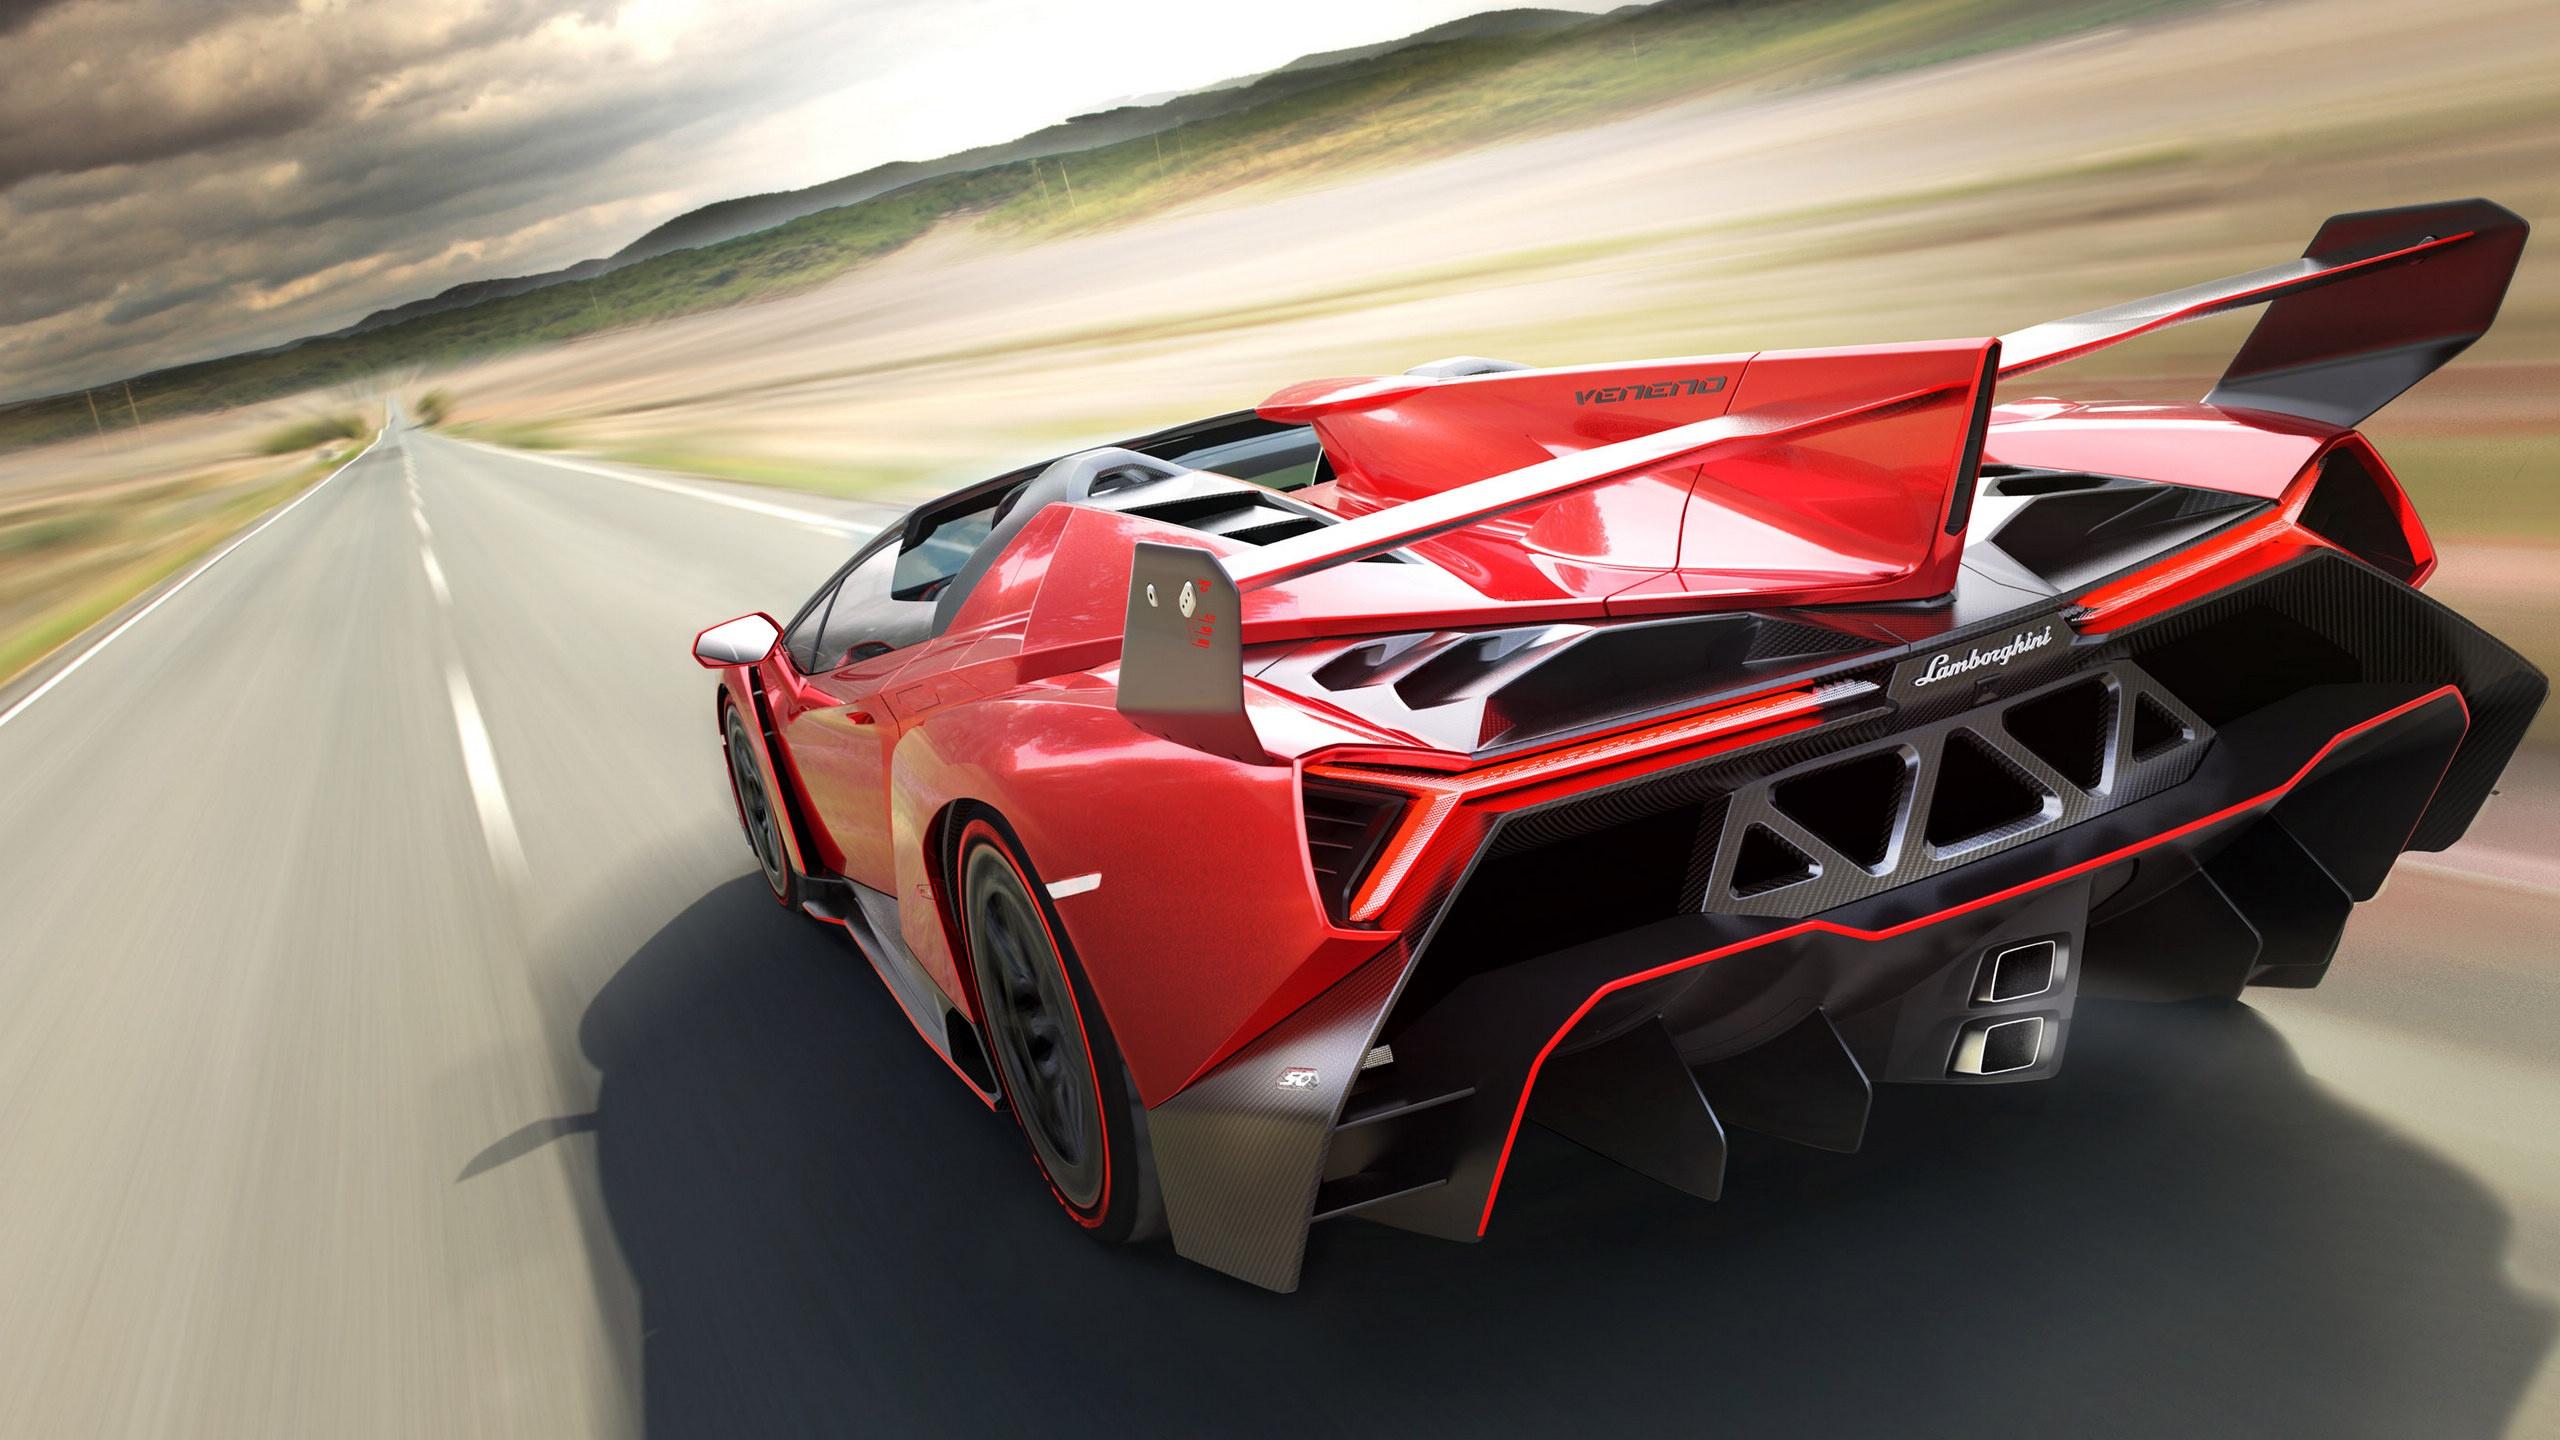 lamborghini Ламборгини движение Lamborghini movement скачать